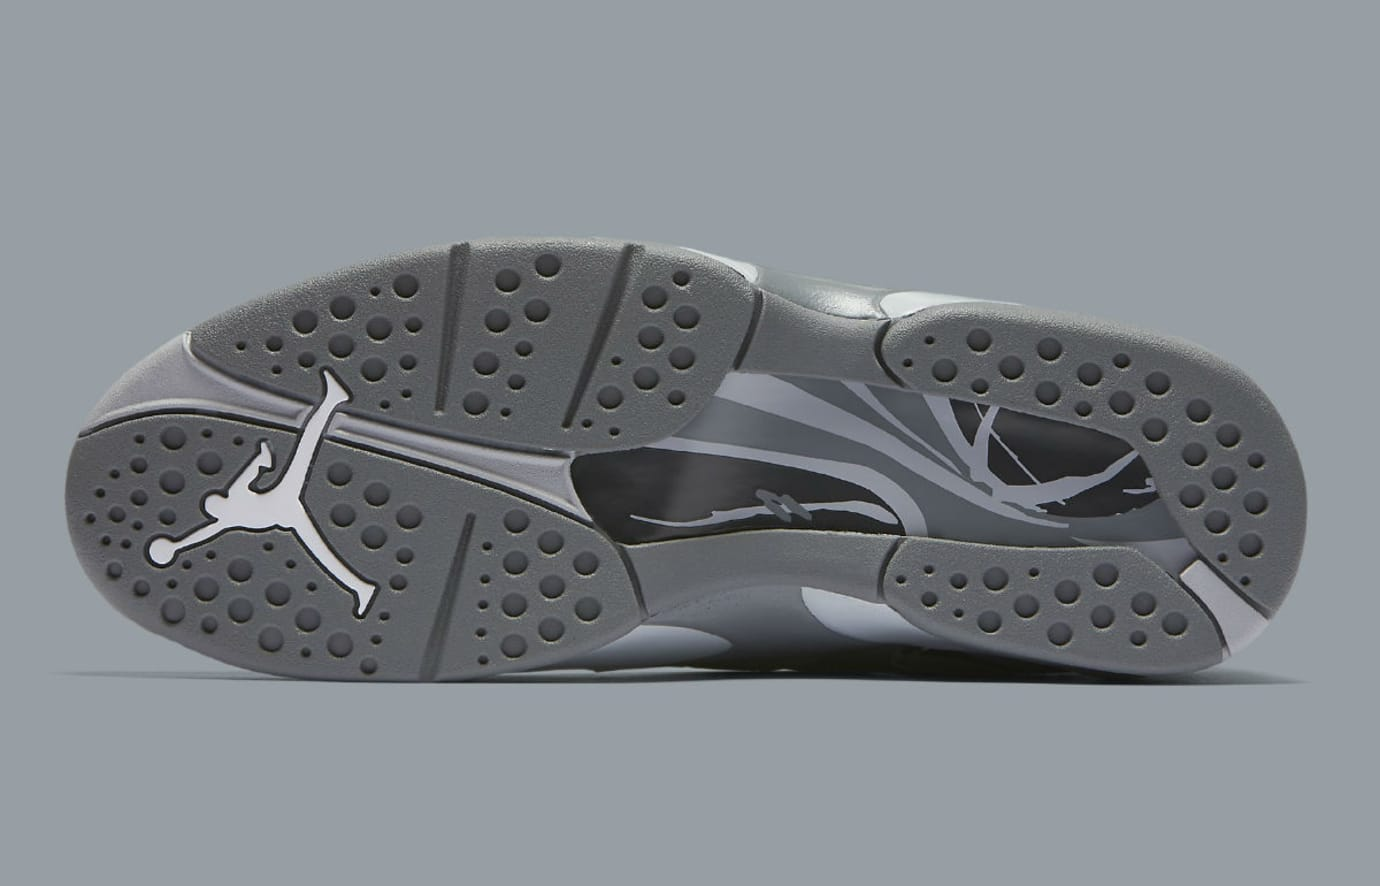 c81204997d36 Air Jordan 8 VIII Cool Grey Release Date Sole 305381-014